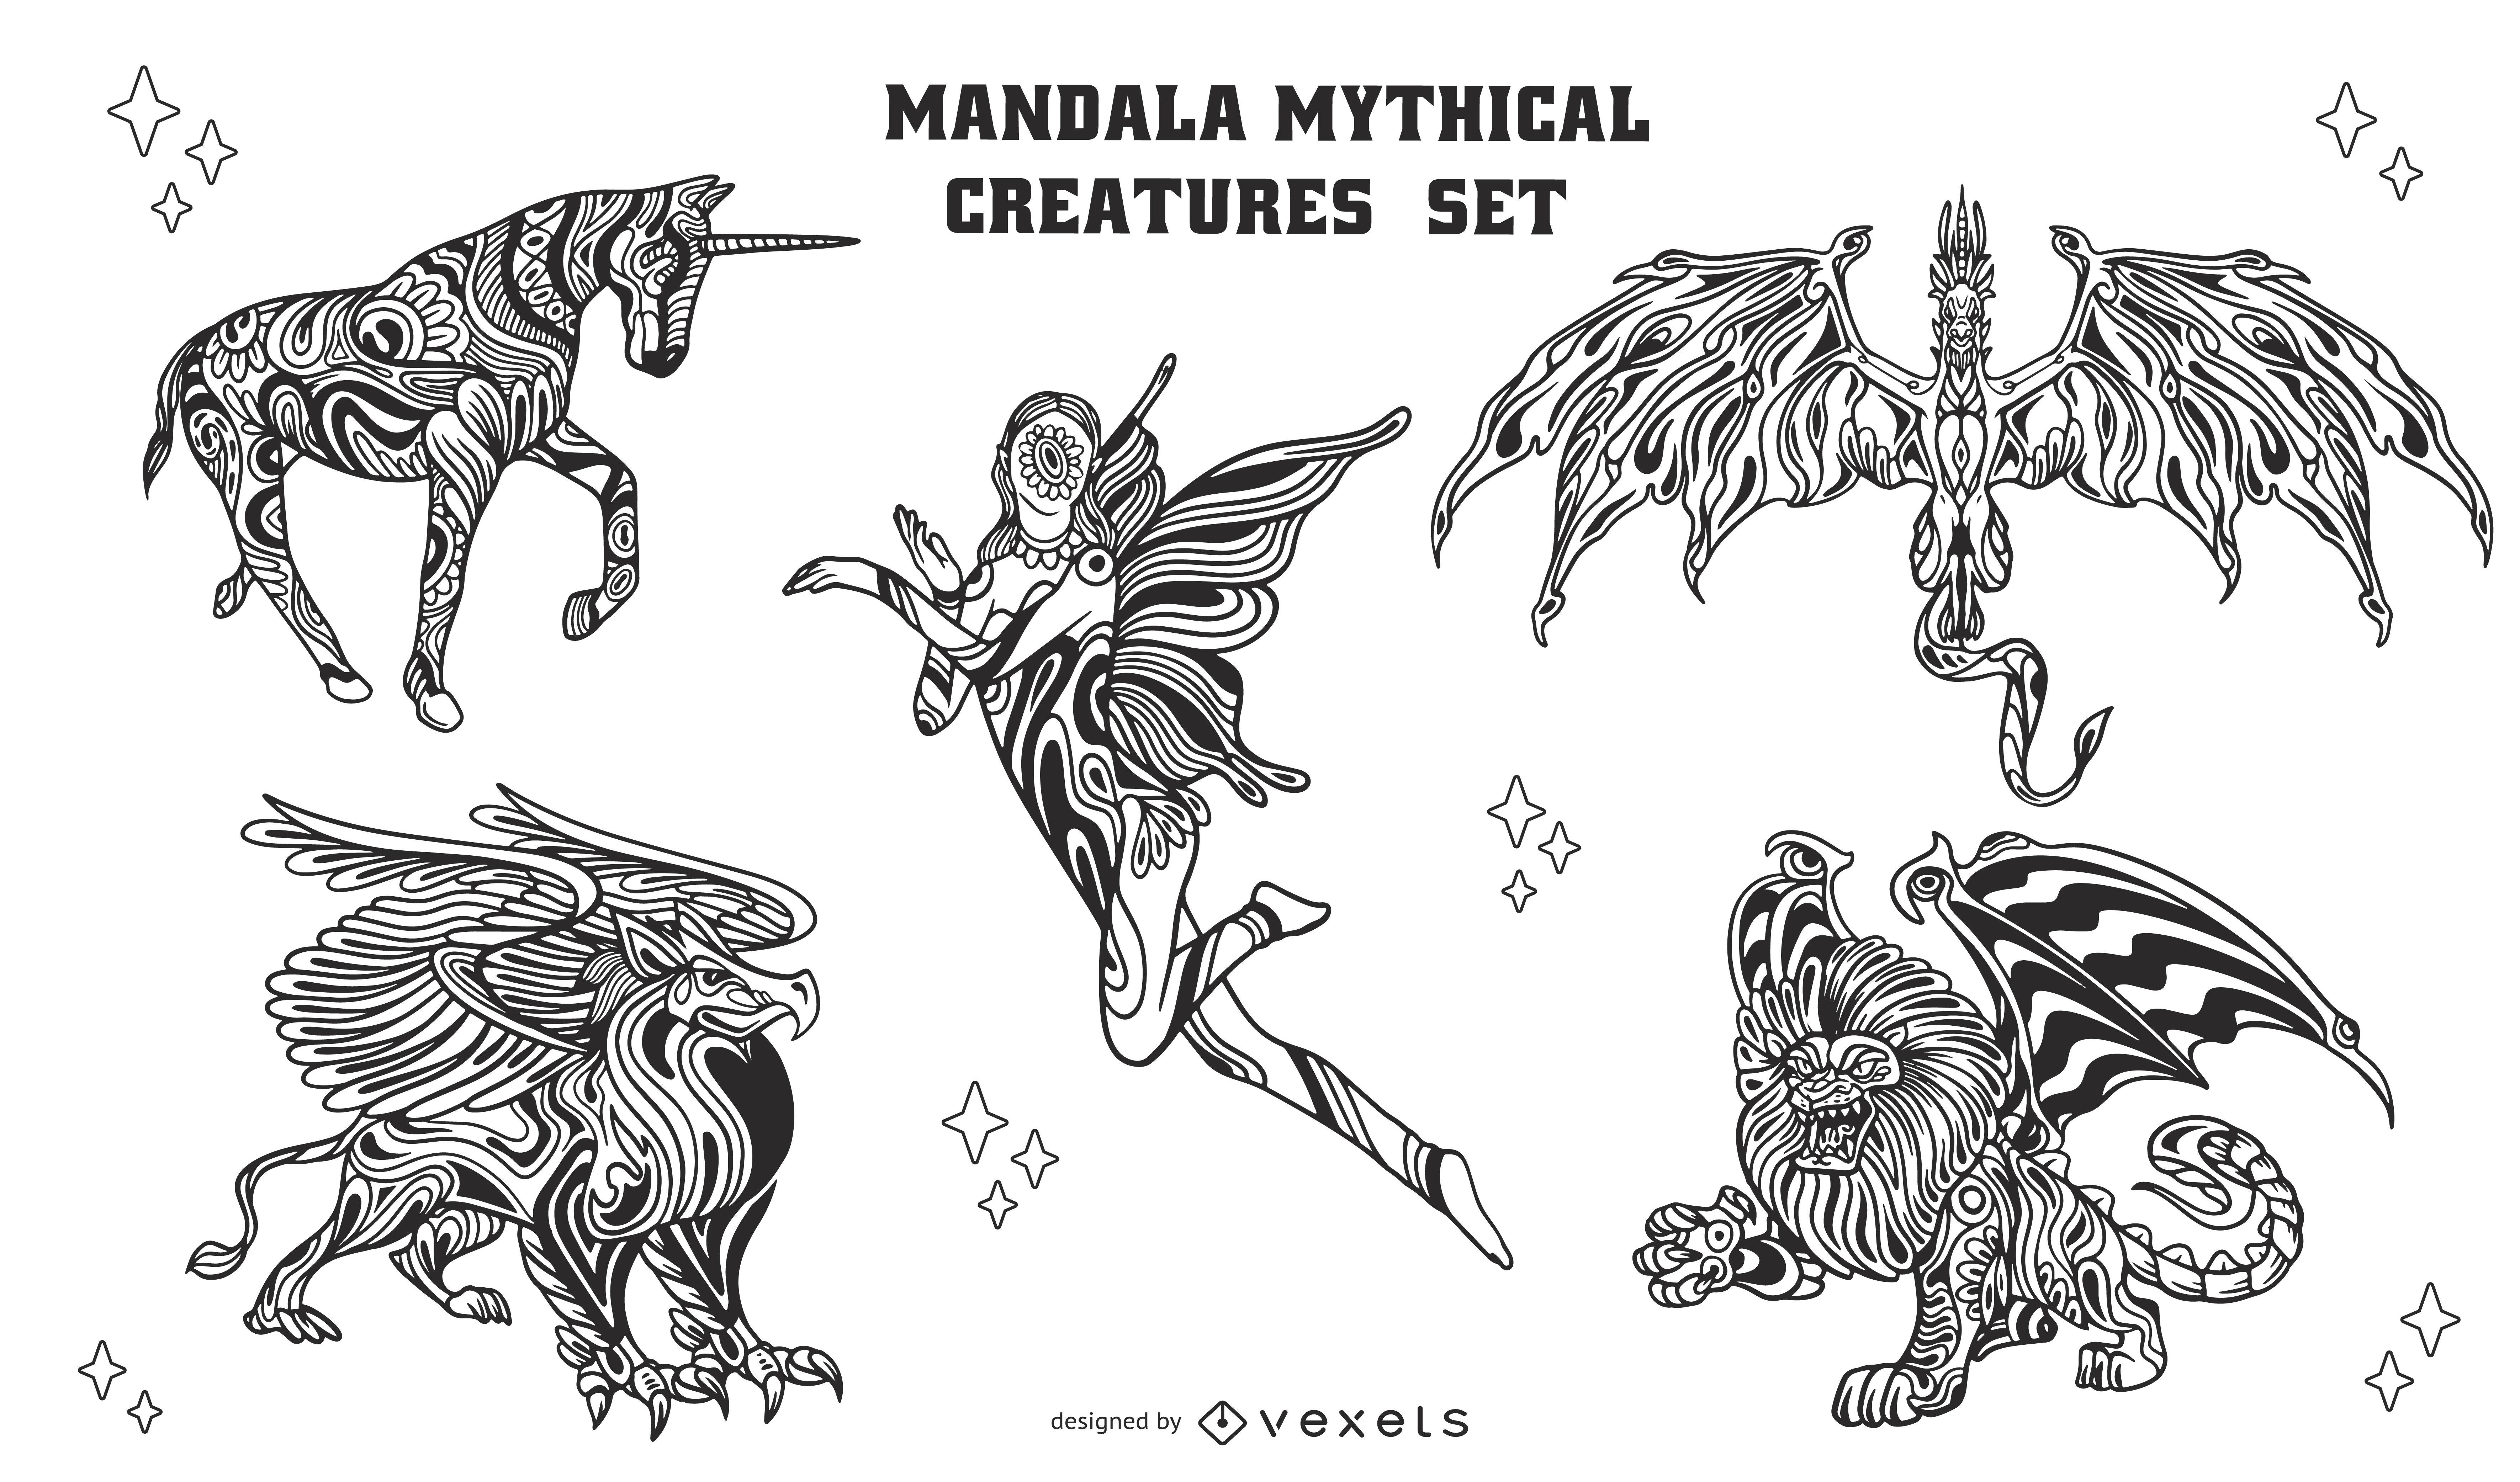 Cool mandala mythical creatures set